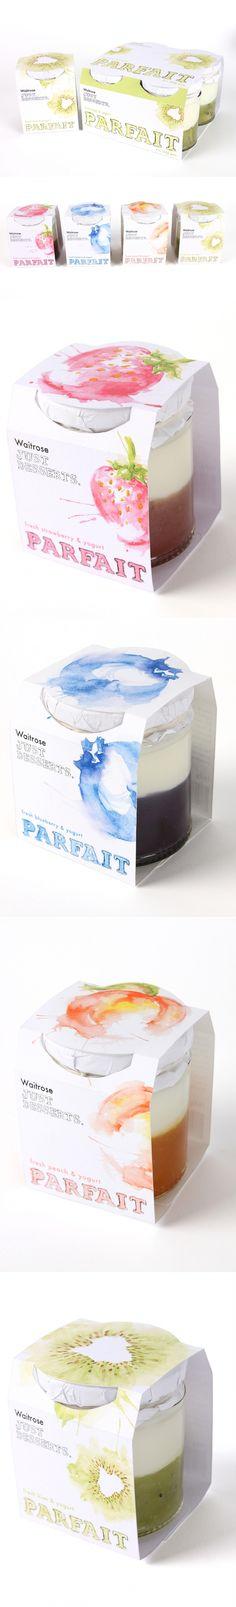 Waitrose Just Desserts Packaging Design